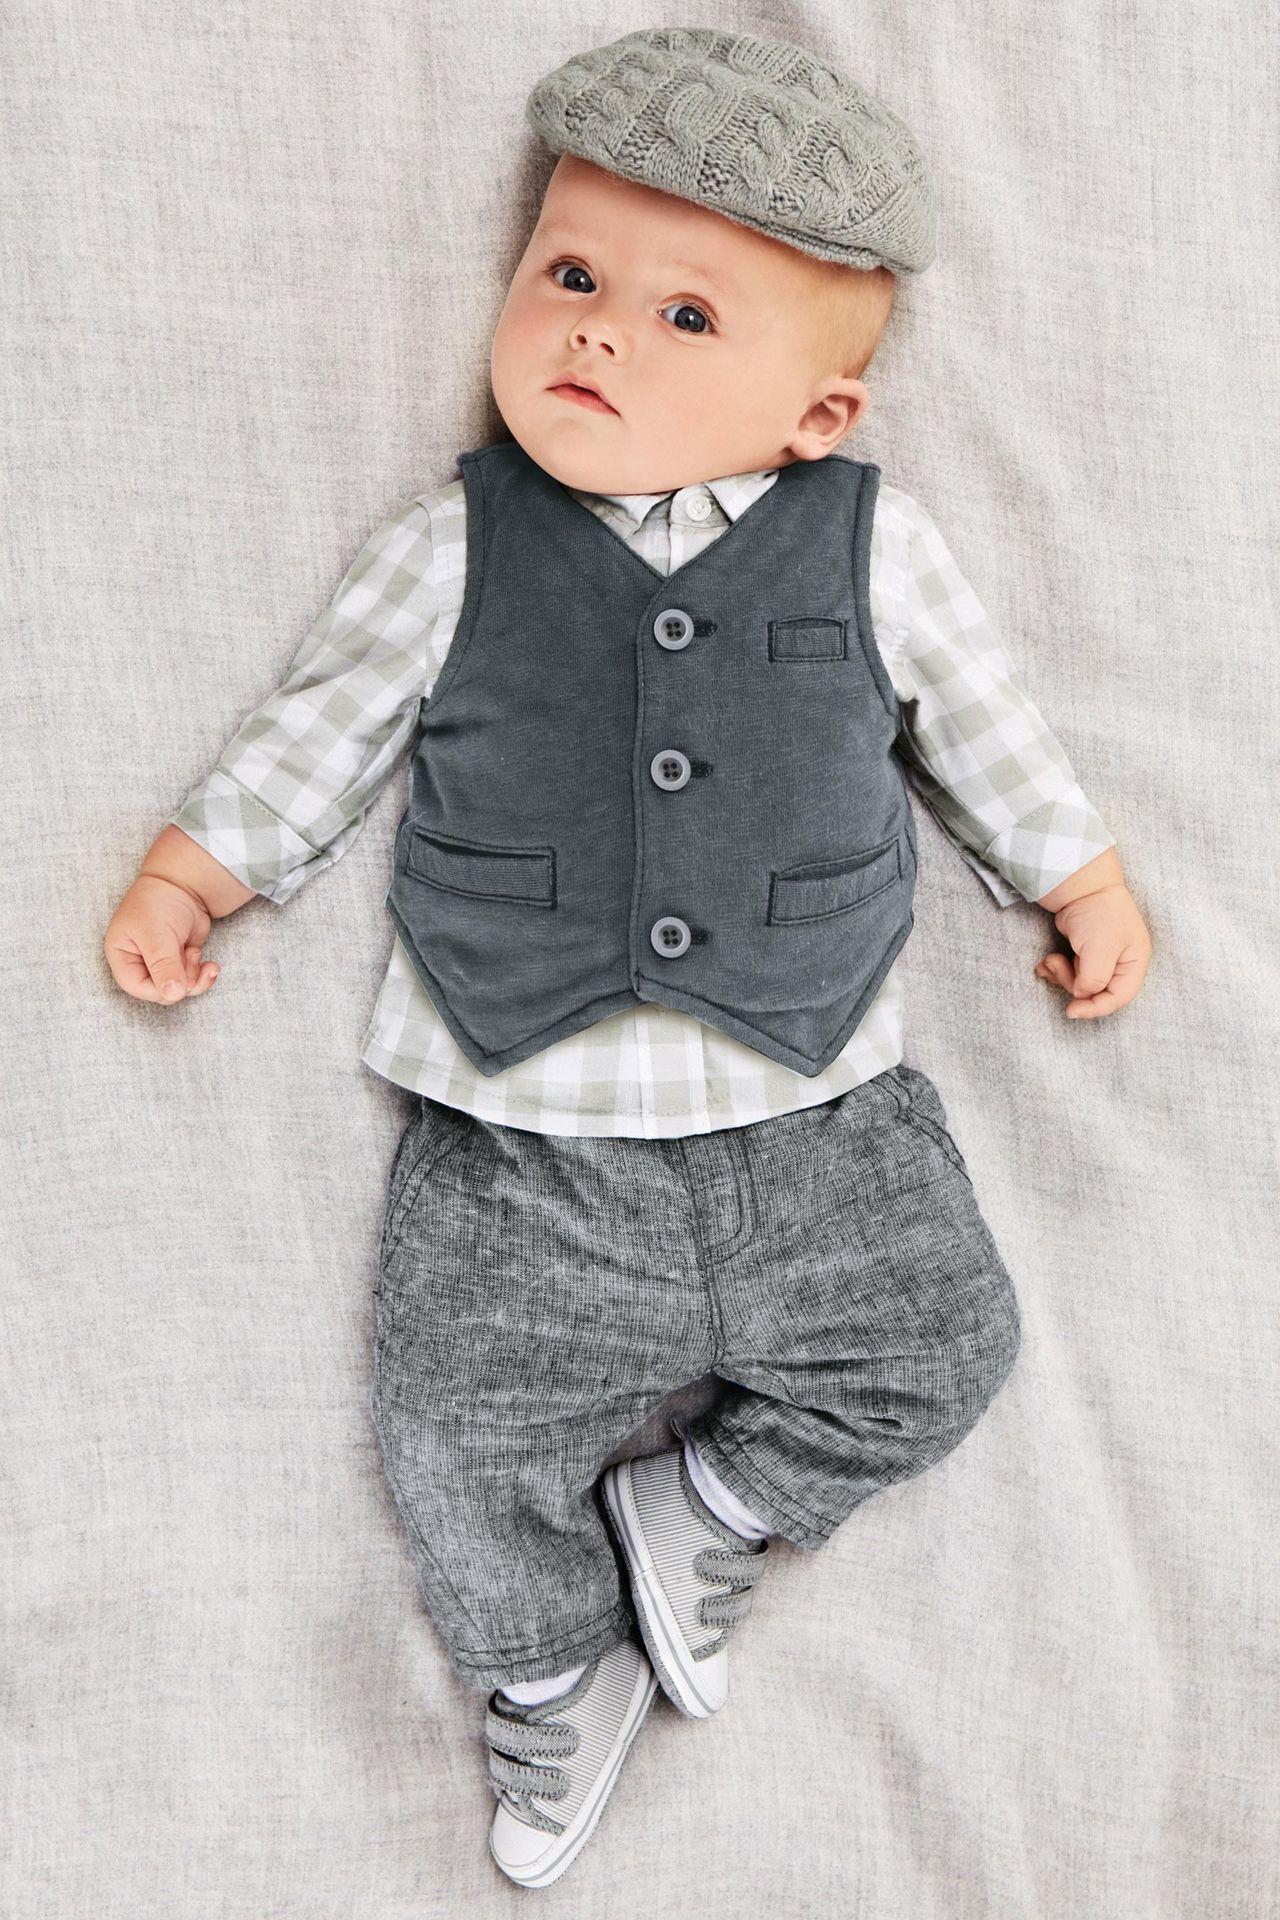 2015 Spring Autumn Baby Boys Outfits Vest Jacket Waistcoat denim ...